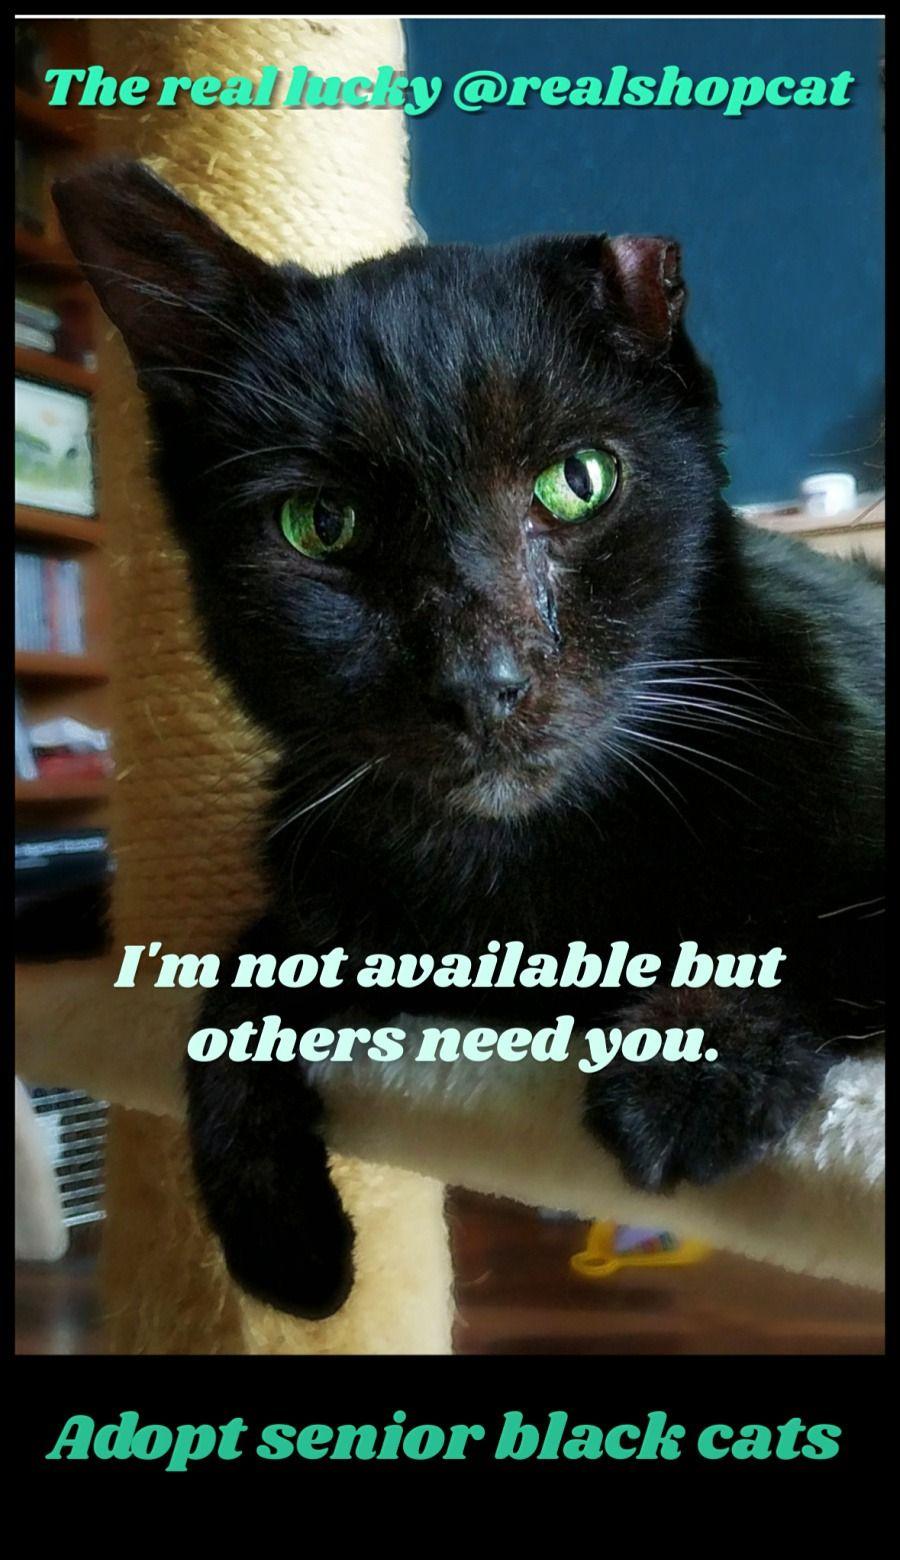 Real Shop Cat Inspires Senior Adoption Cat Wisdom 101 Everything Feline Since 2011 Cat Adoption Cats Adoption